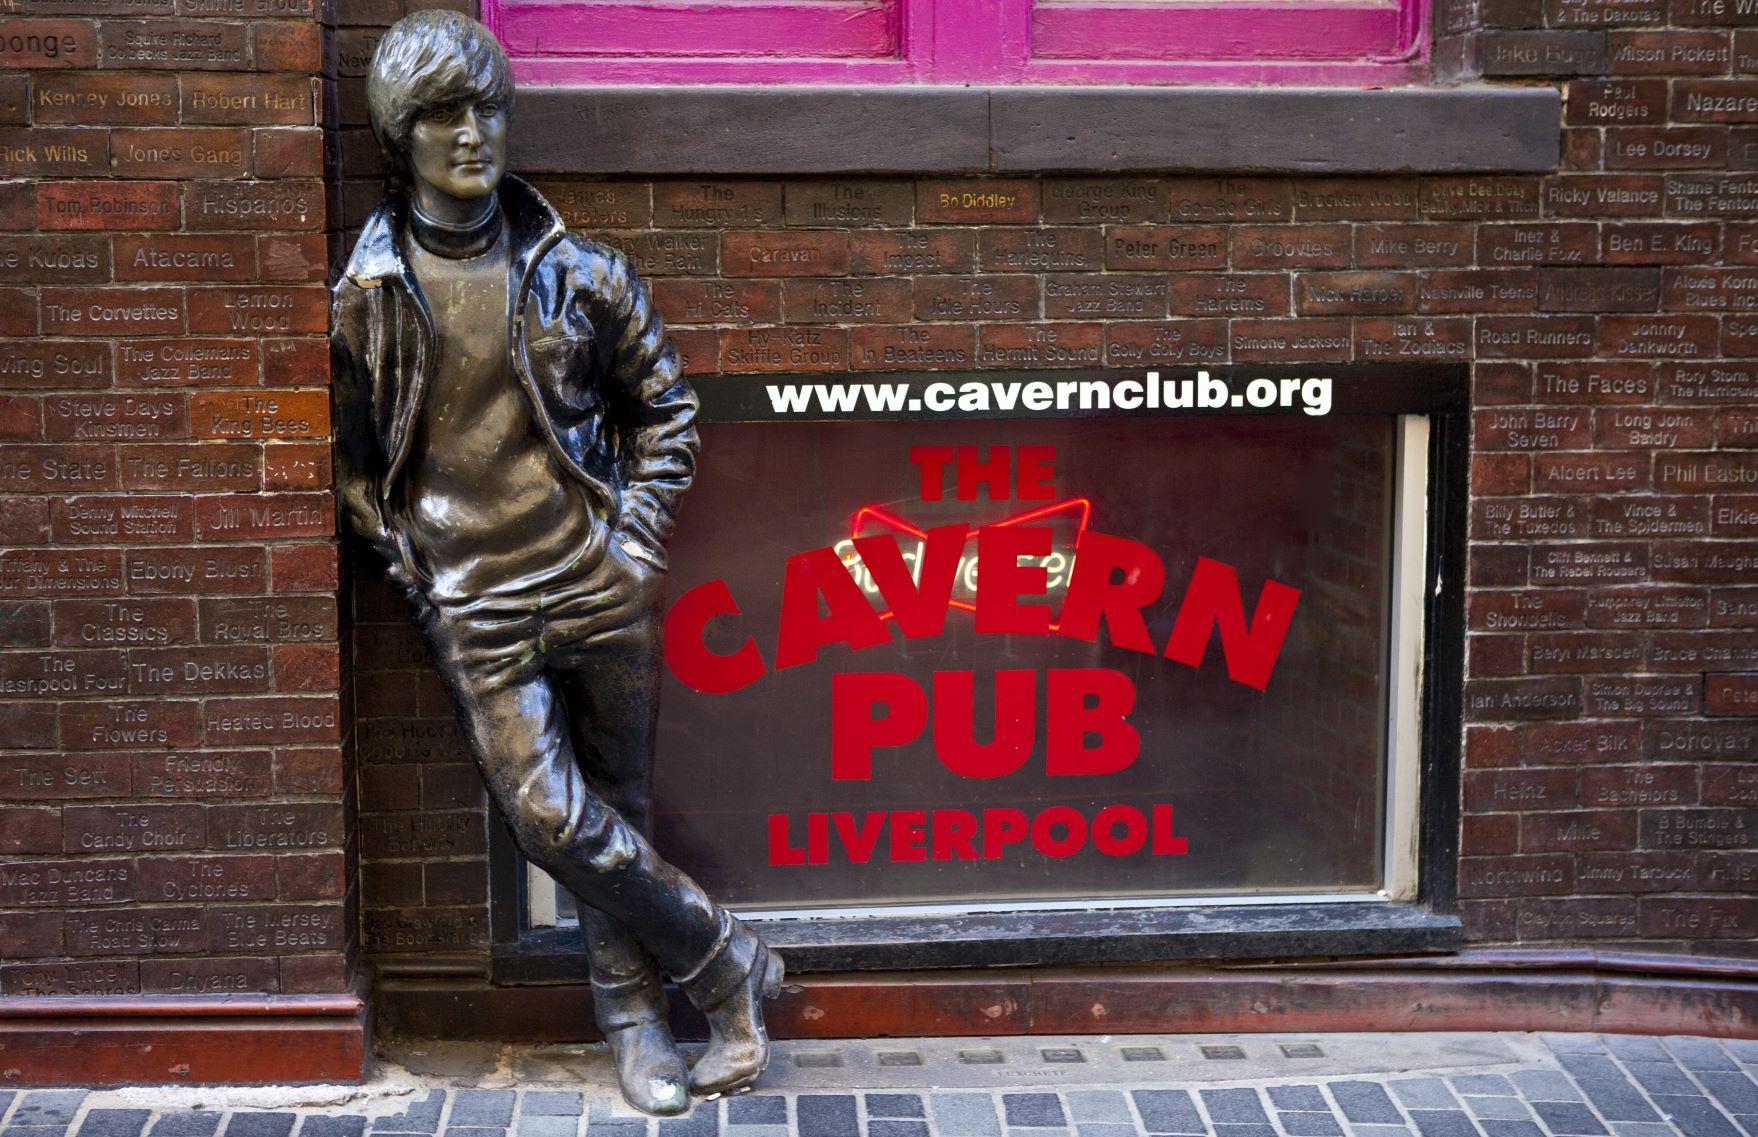 John Lennon bronze statue outside The Cavern Pub, Liverpool (Shutterstock image)